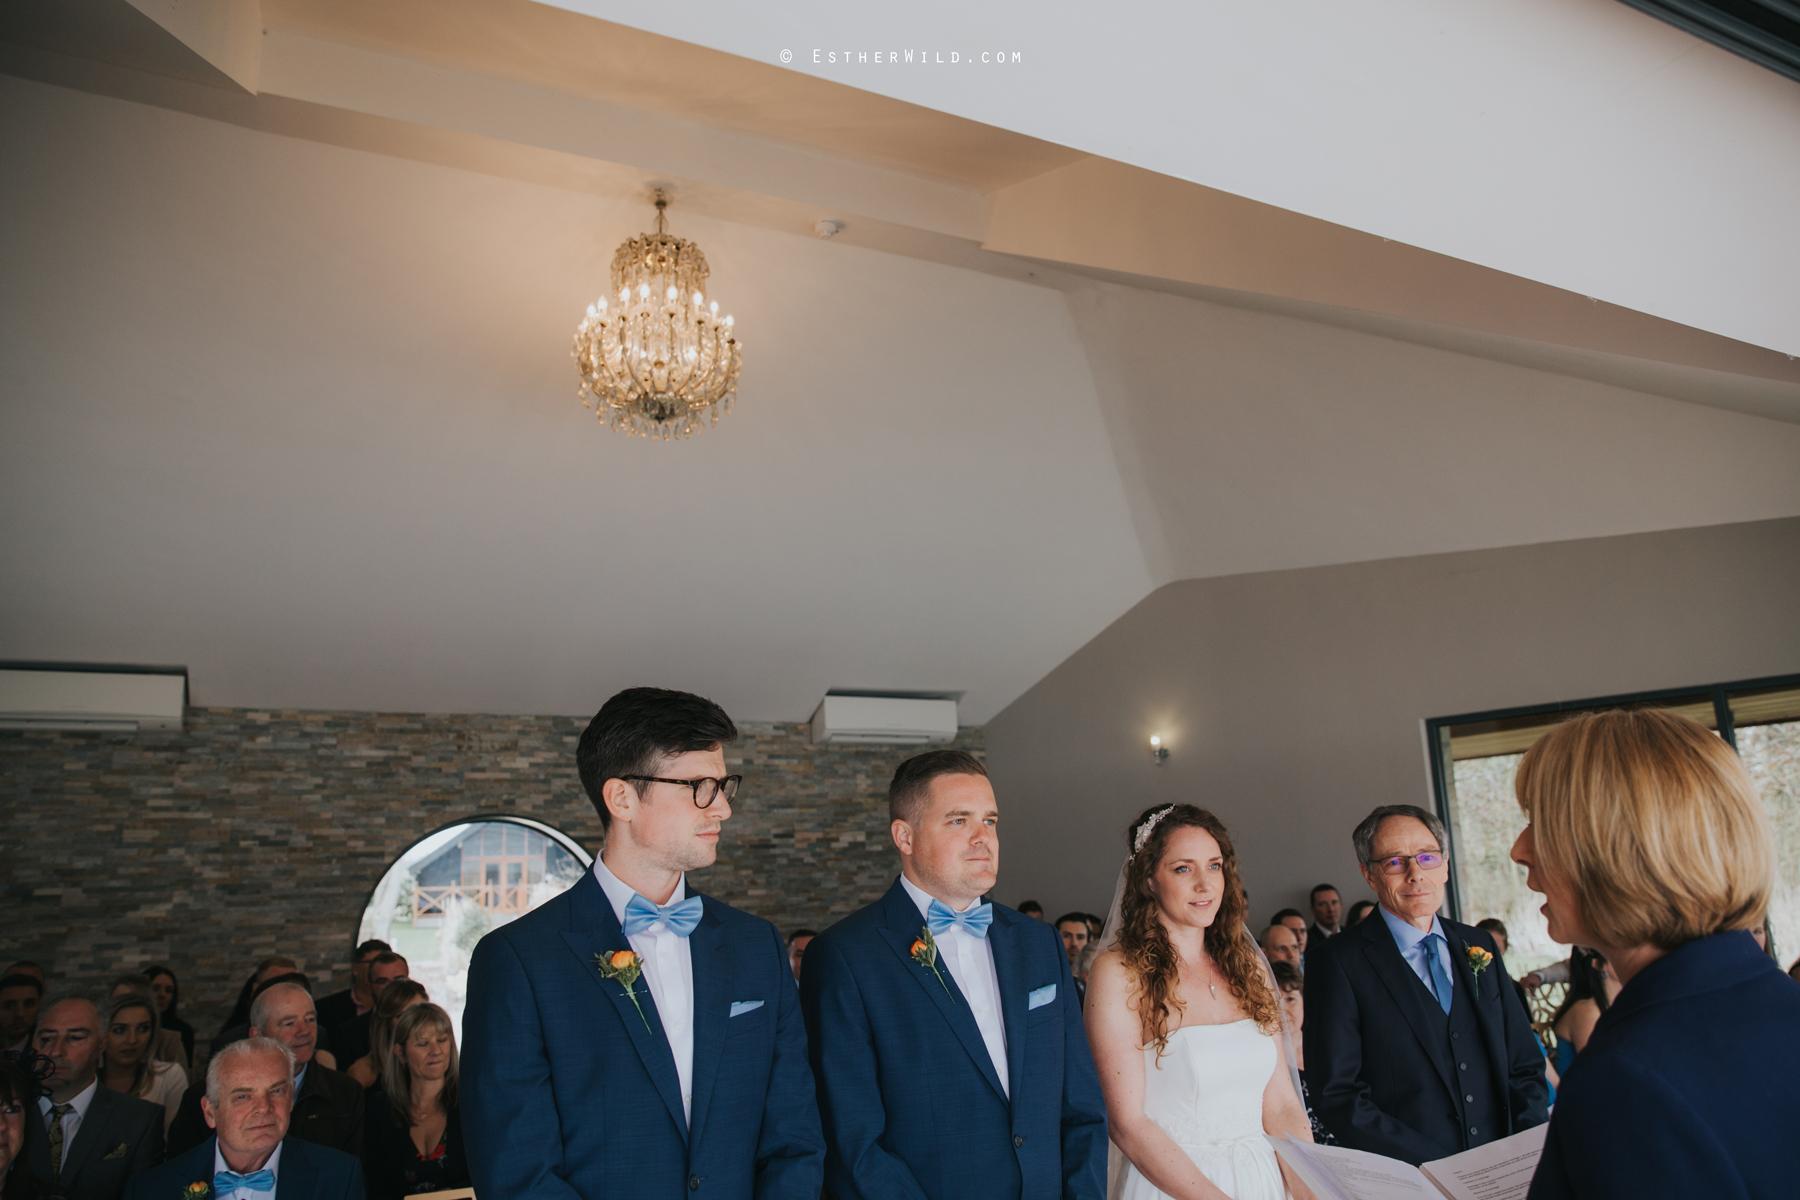 The_BoatHouse_Wedding_Venue_Ormesby_Norfolk_Broads_Boat_Wedding_Photography_Esther_Wild_Photographer_IMG_1058.jpg